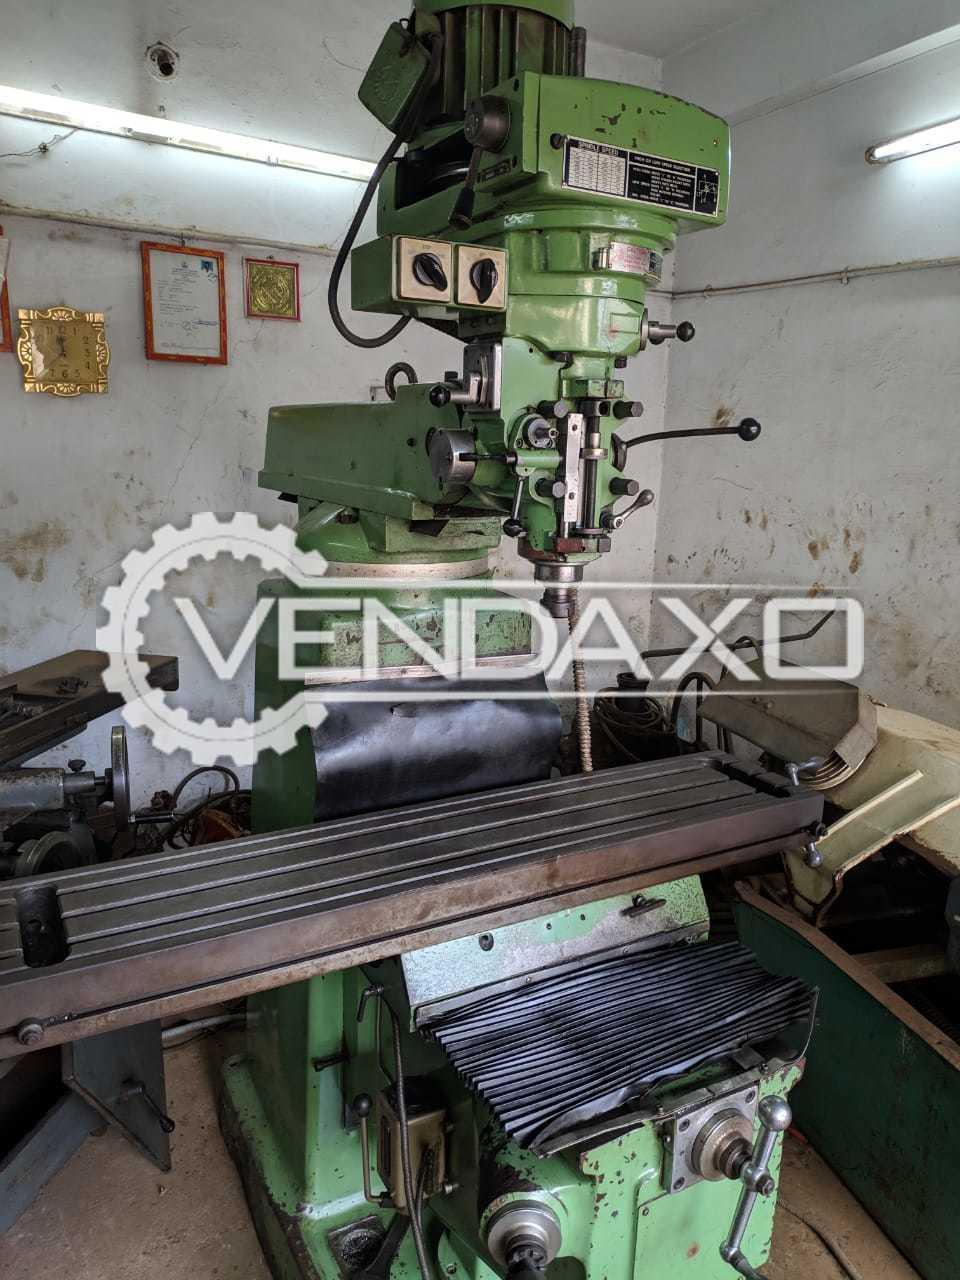 Manford 4KS Milling Machine - Table Size - 1270 x 254 mm